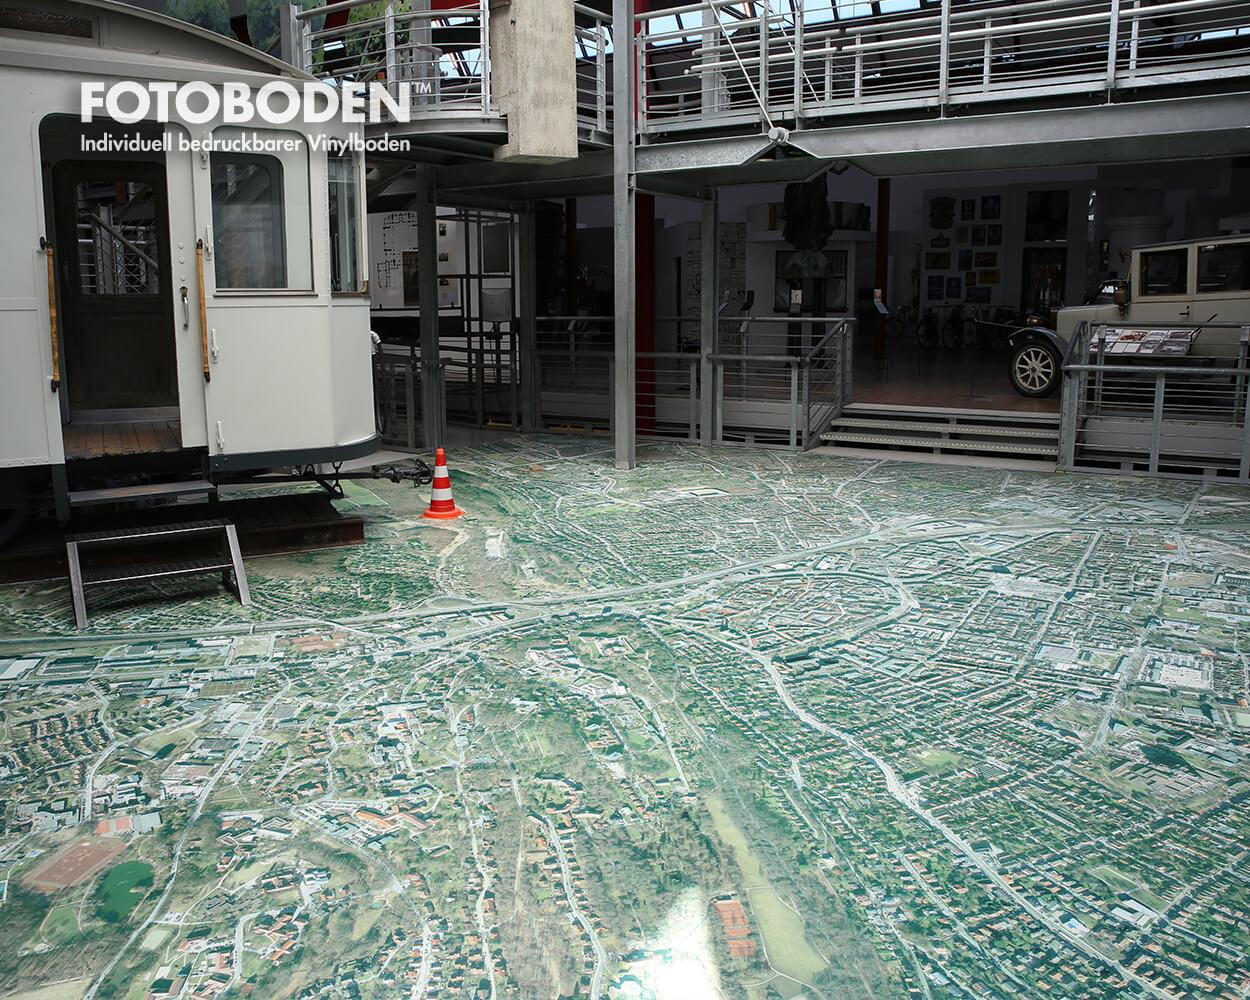 Ausstellungsdesign Museumsboden Fotoboden